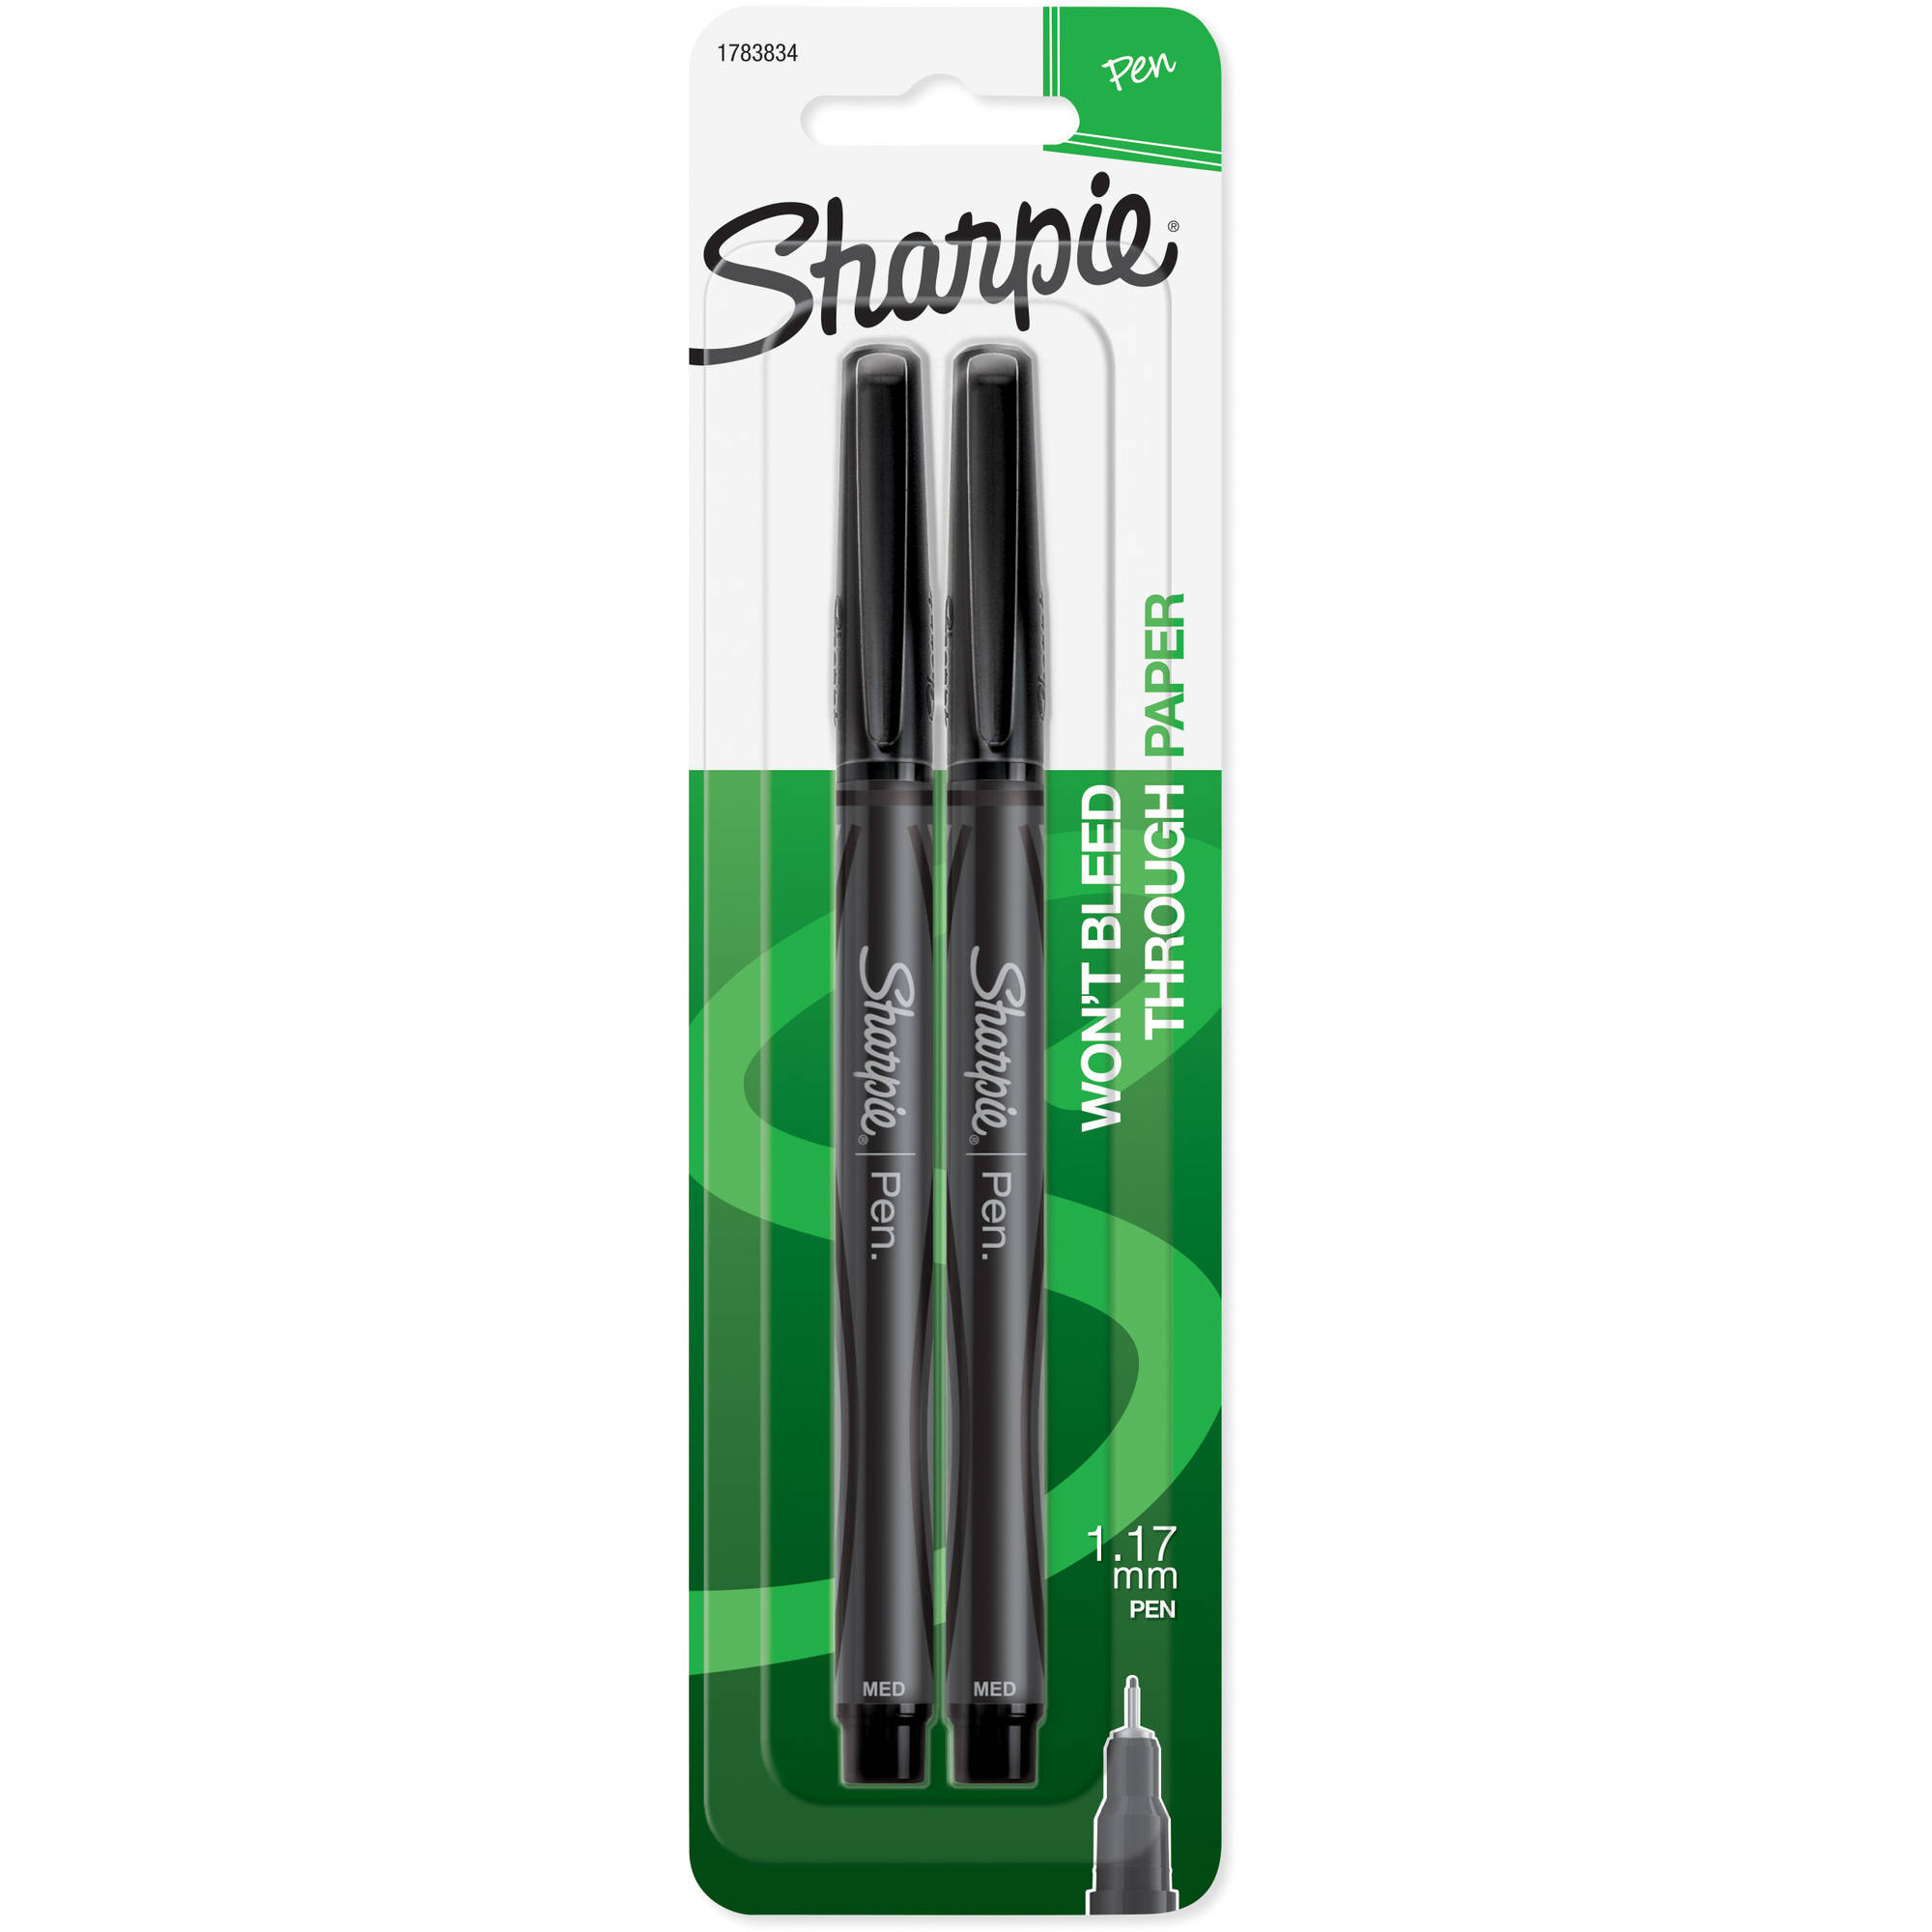 Sharpie Pen Porous Point Pens, Medium Point, Black Ink, 2pk